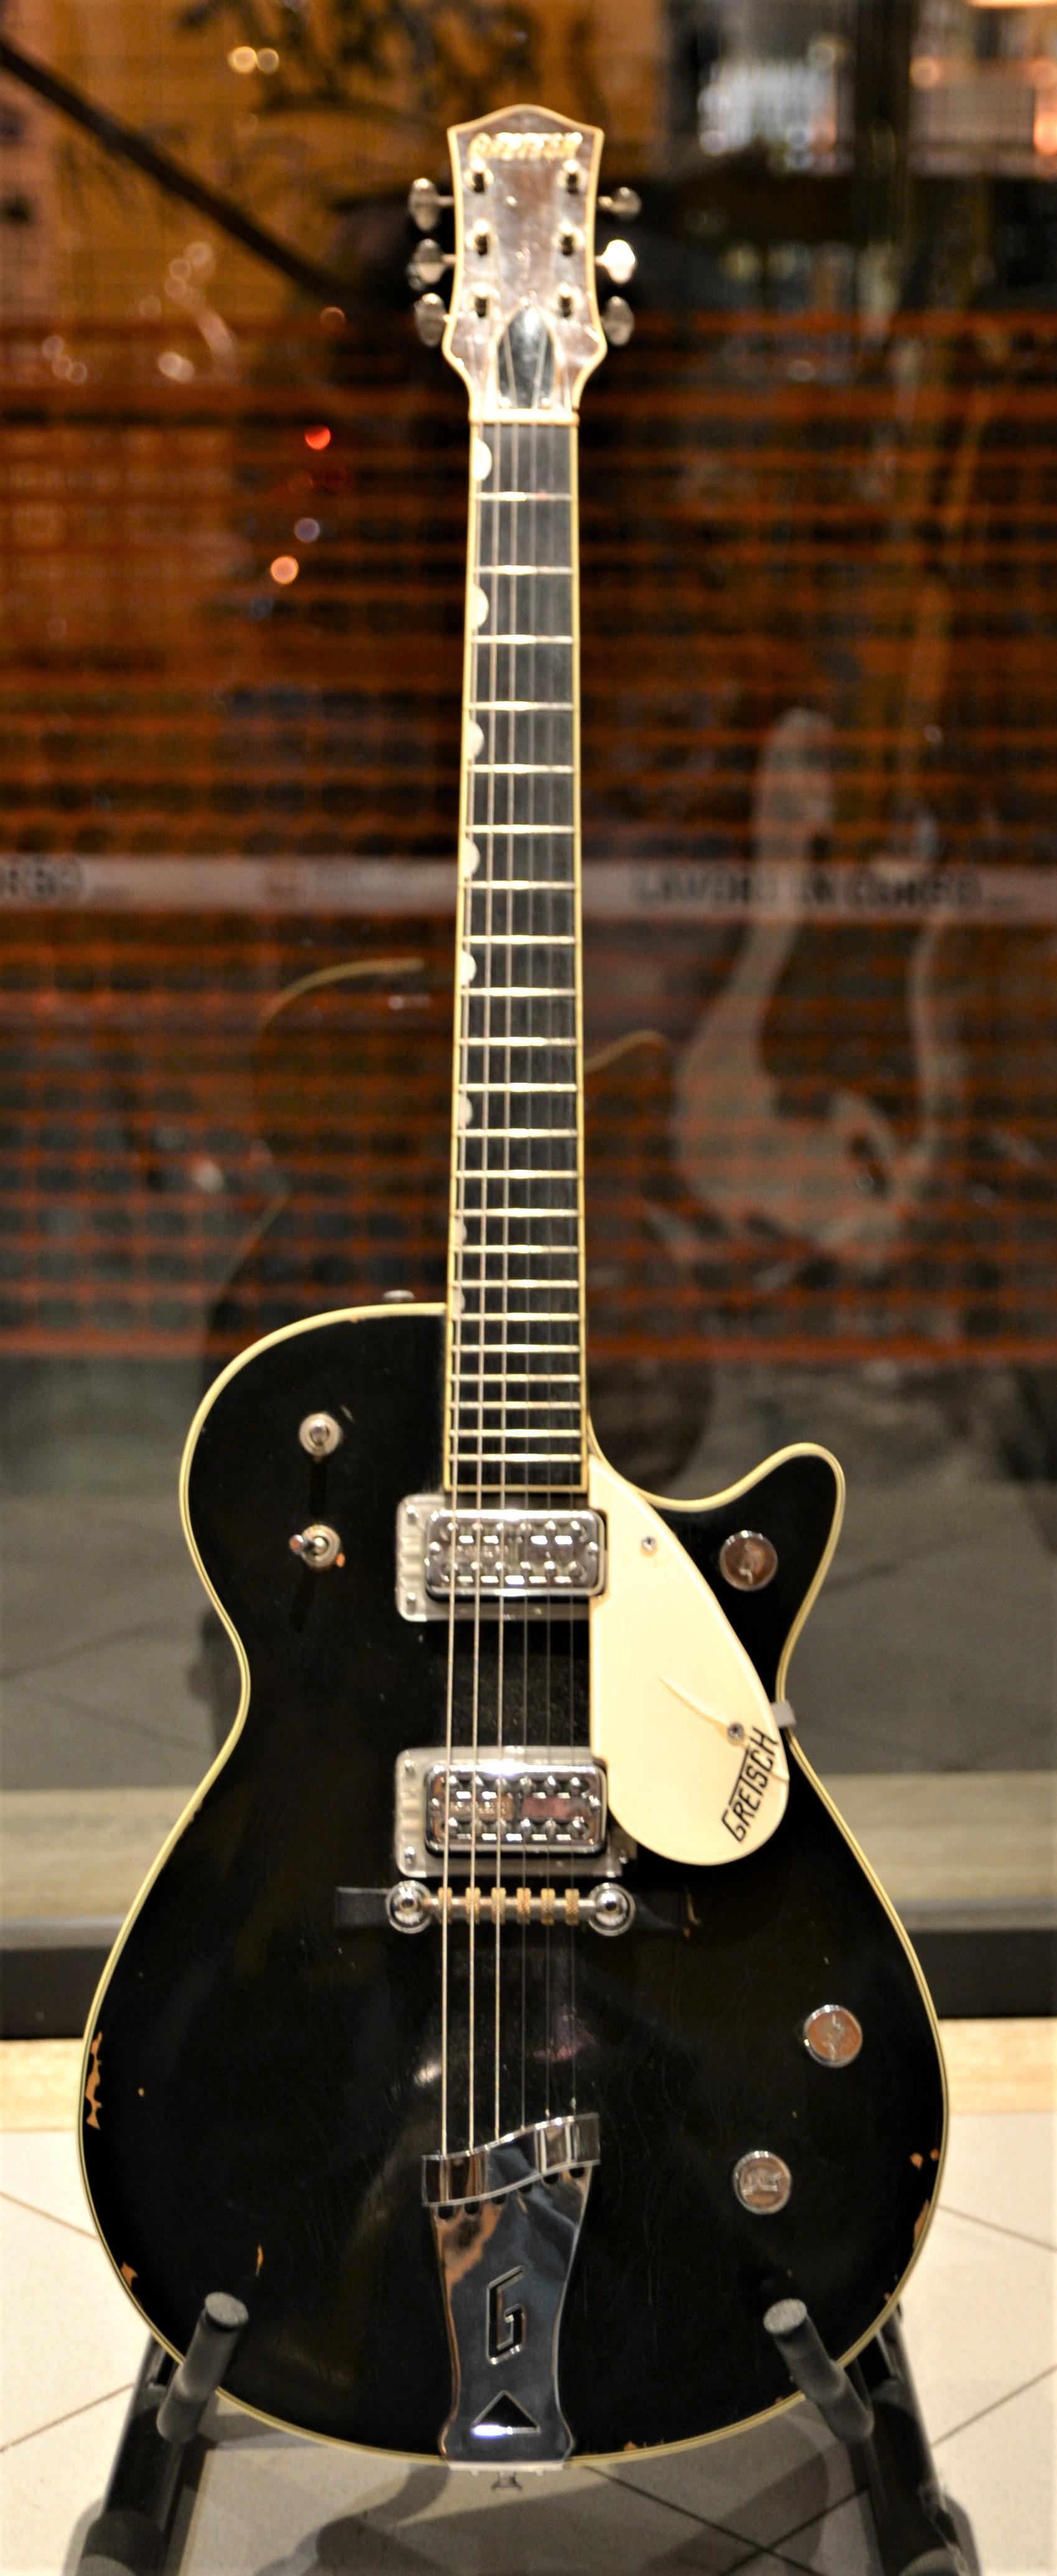 Gretsch Duo Jet 1958 Black Guitar For Sale Rome Vintage